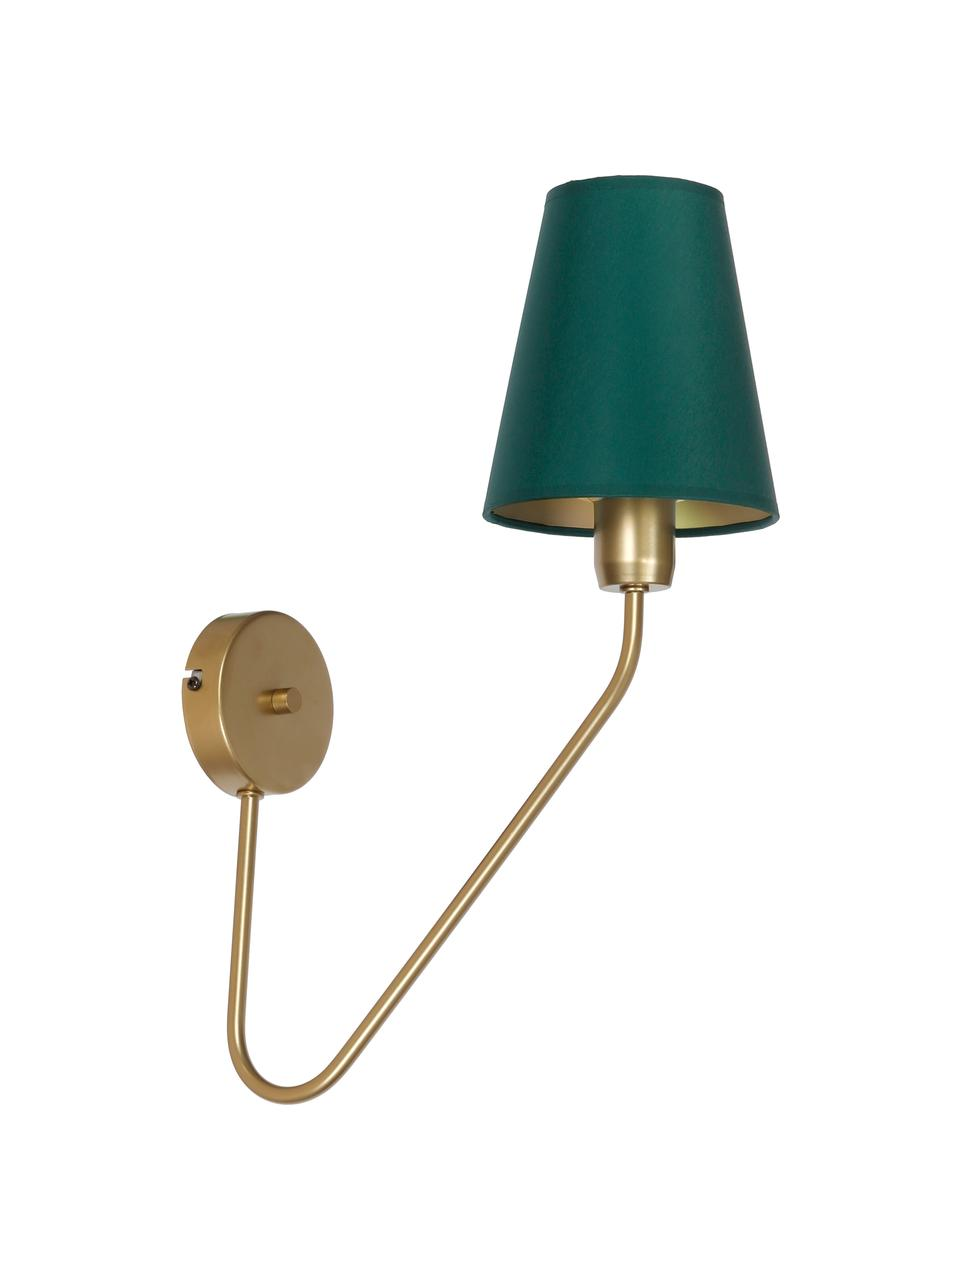 Applique di design Victoria, Paralume: poliestere cotone, Verde, dorato, Larg. 15 x Alt. 50 cm